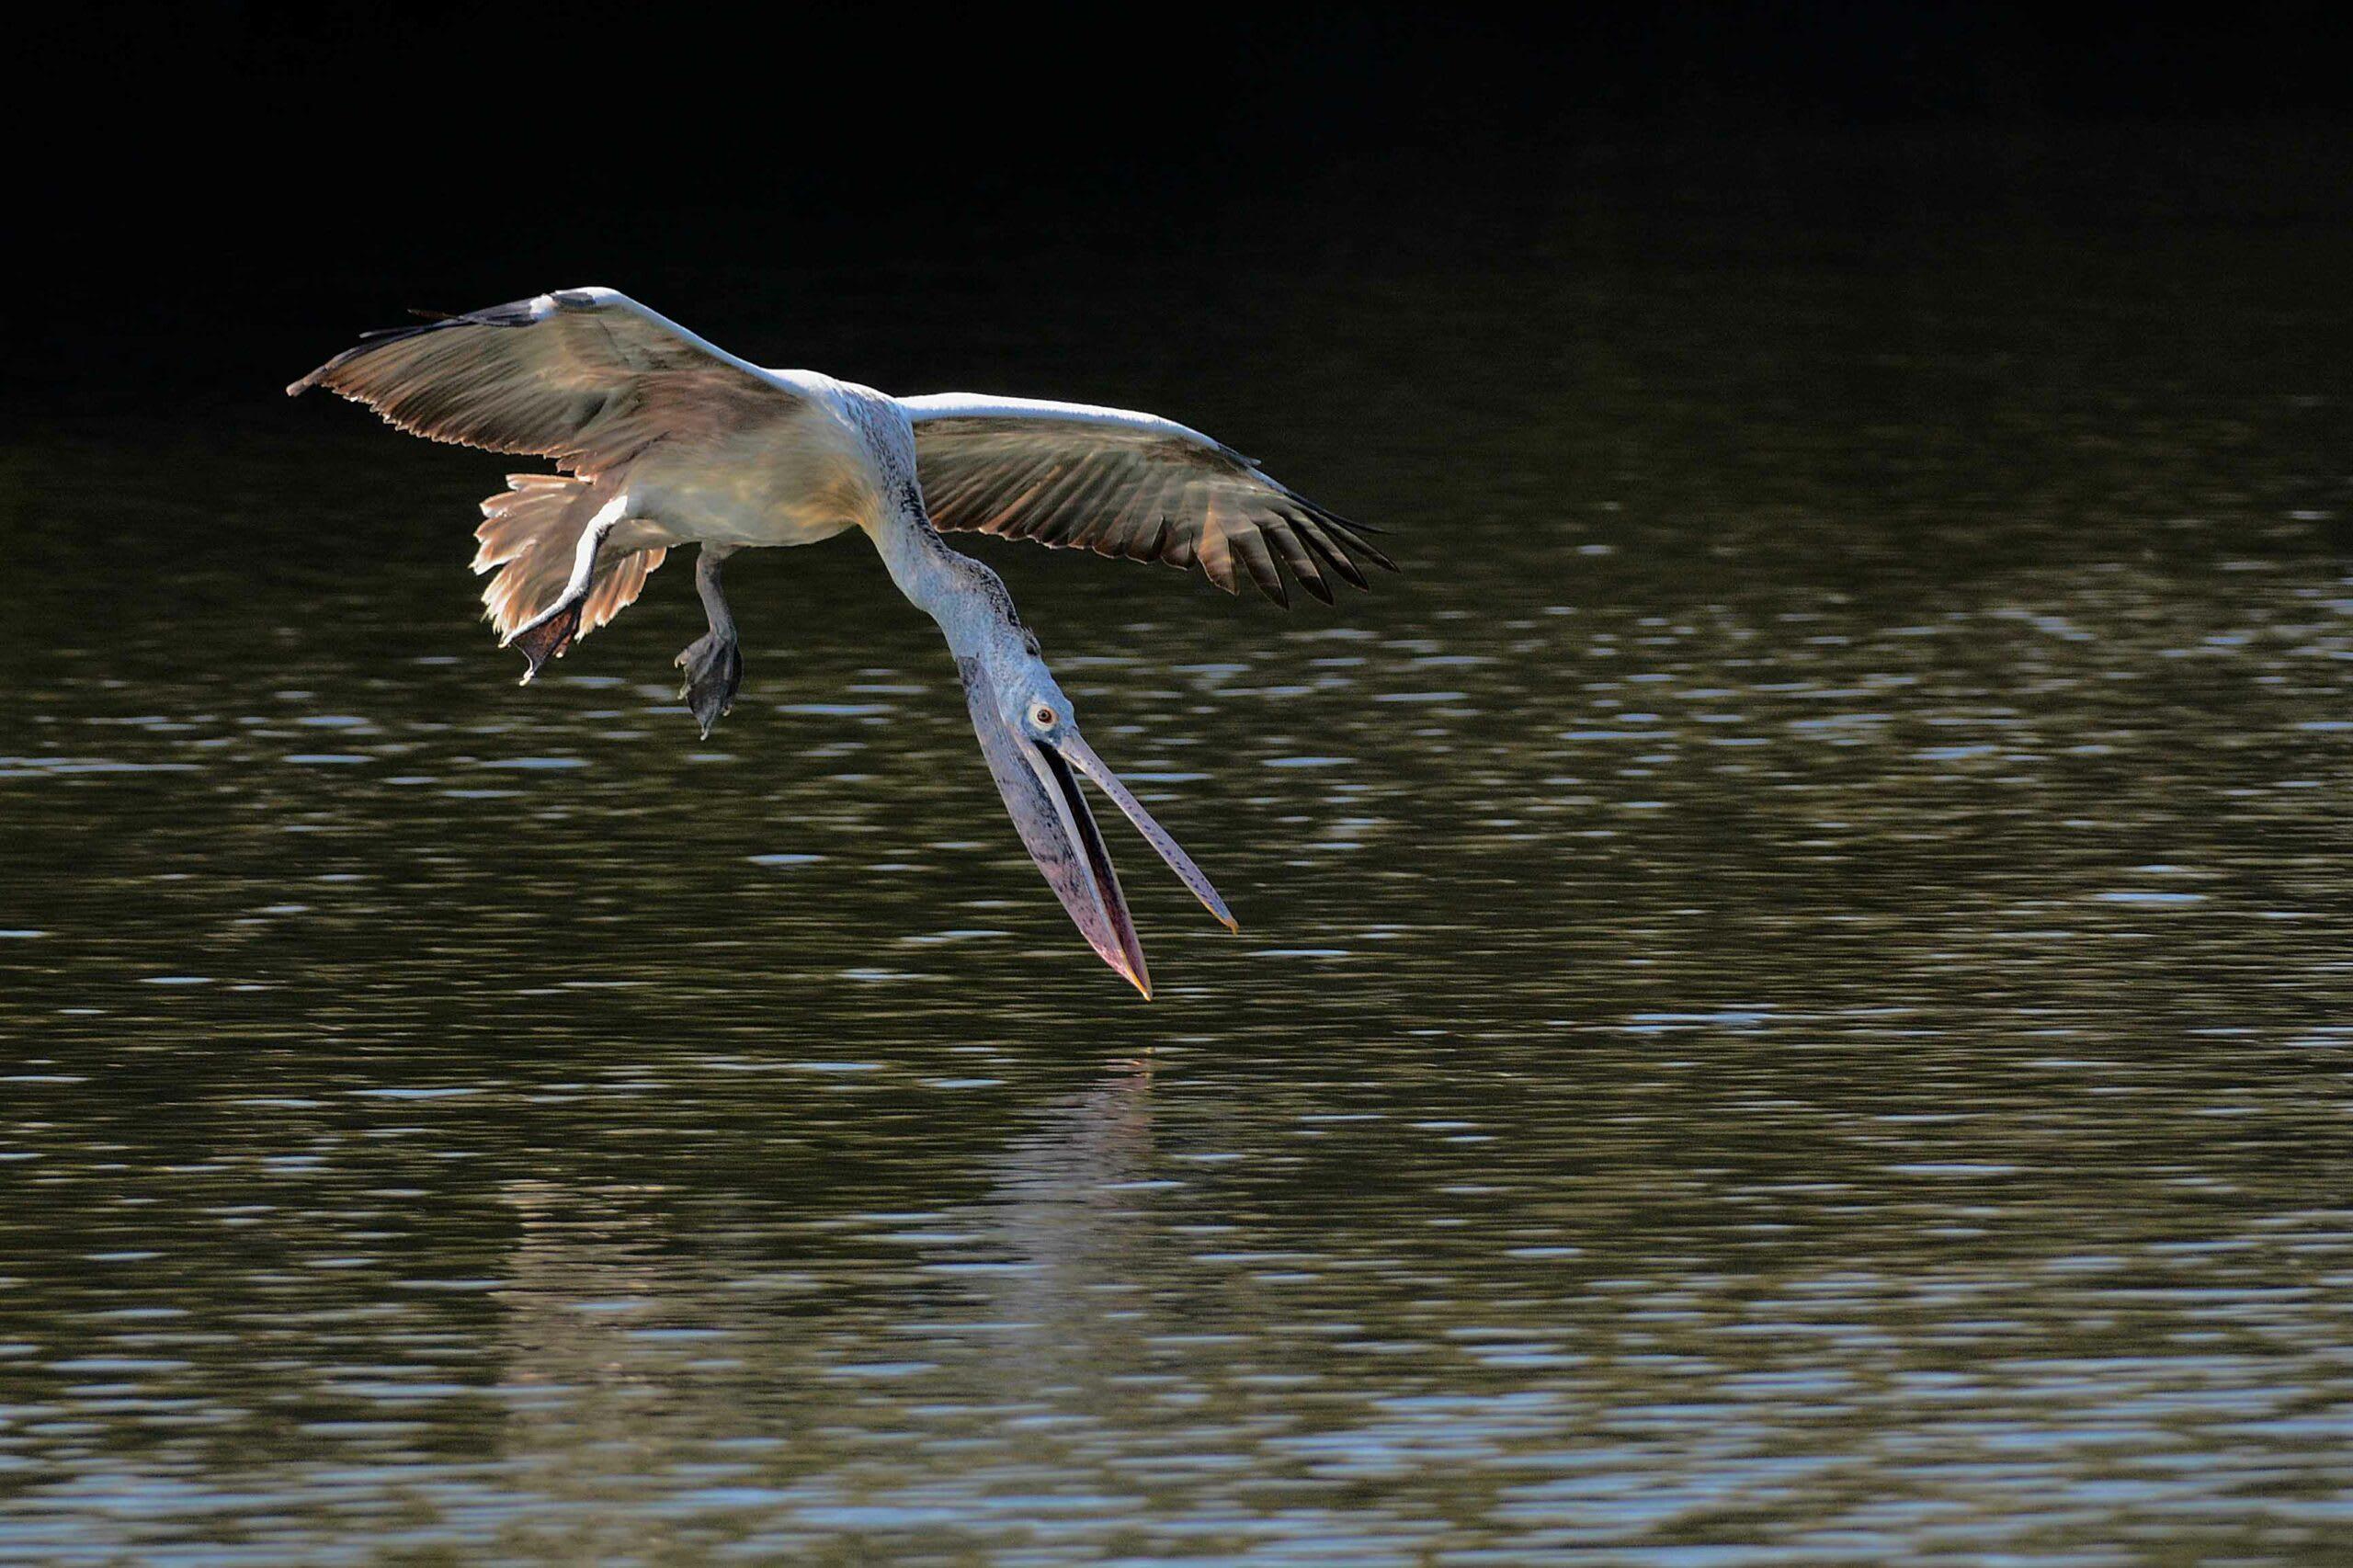 Spot-billed pelican hunting